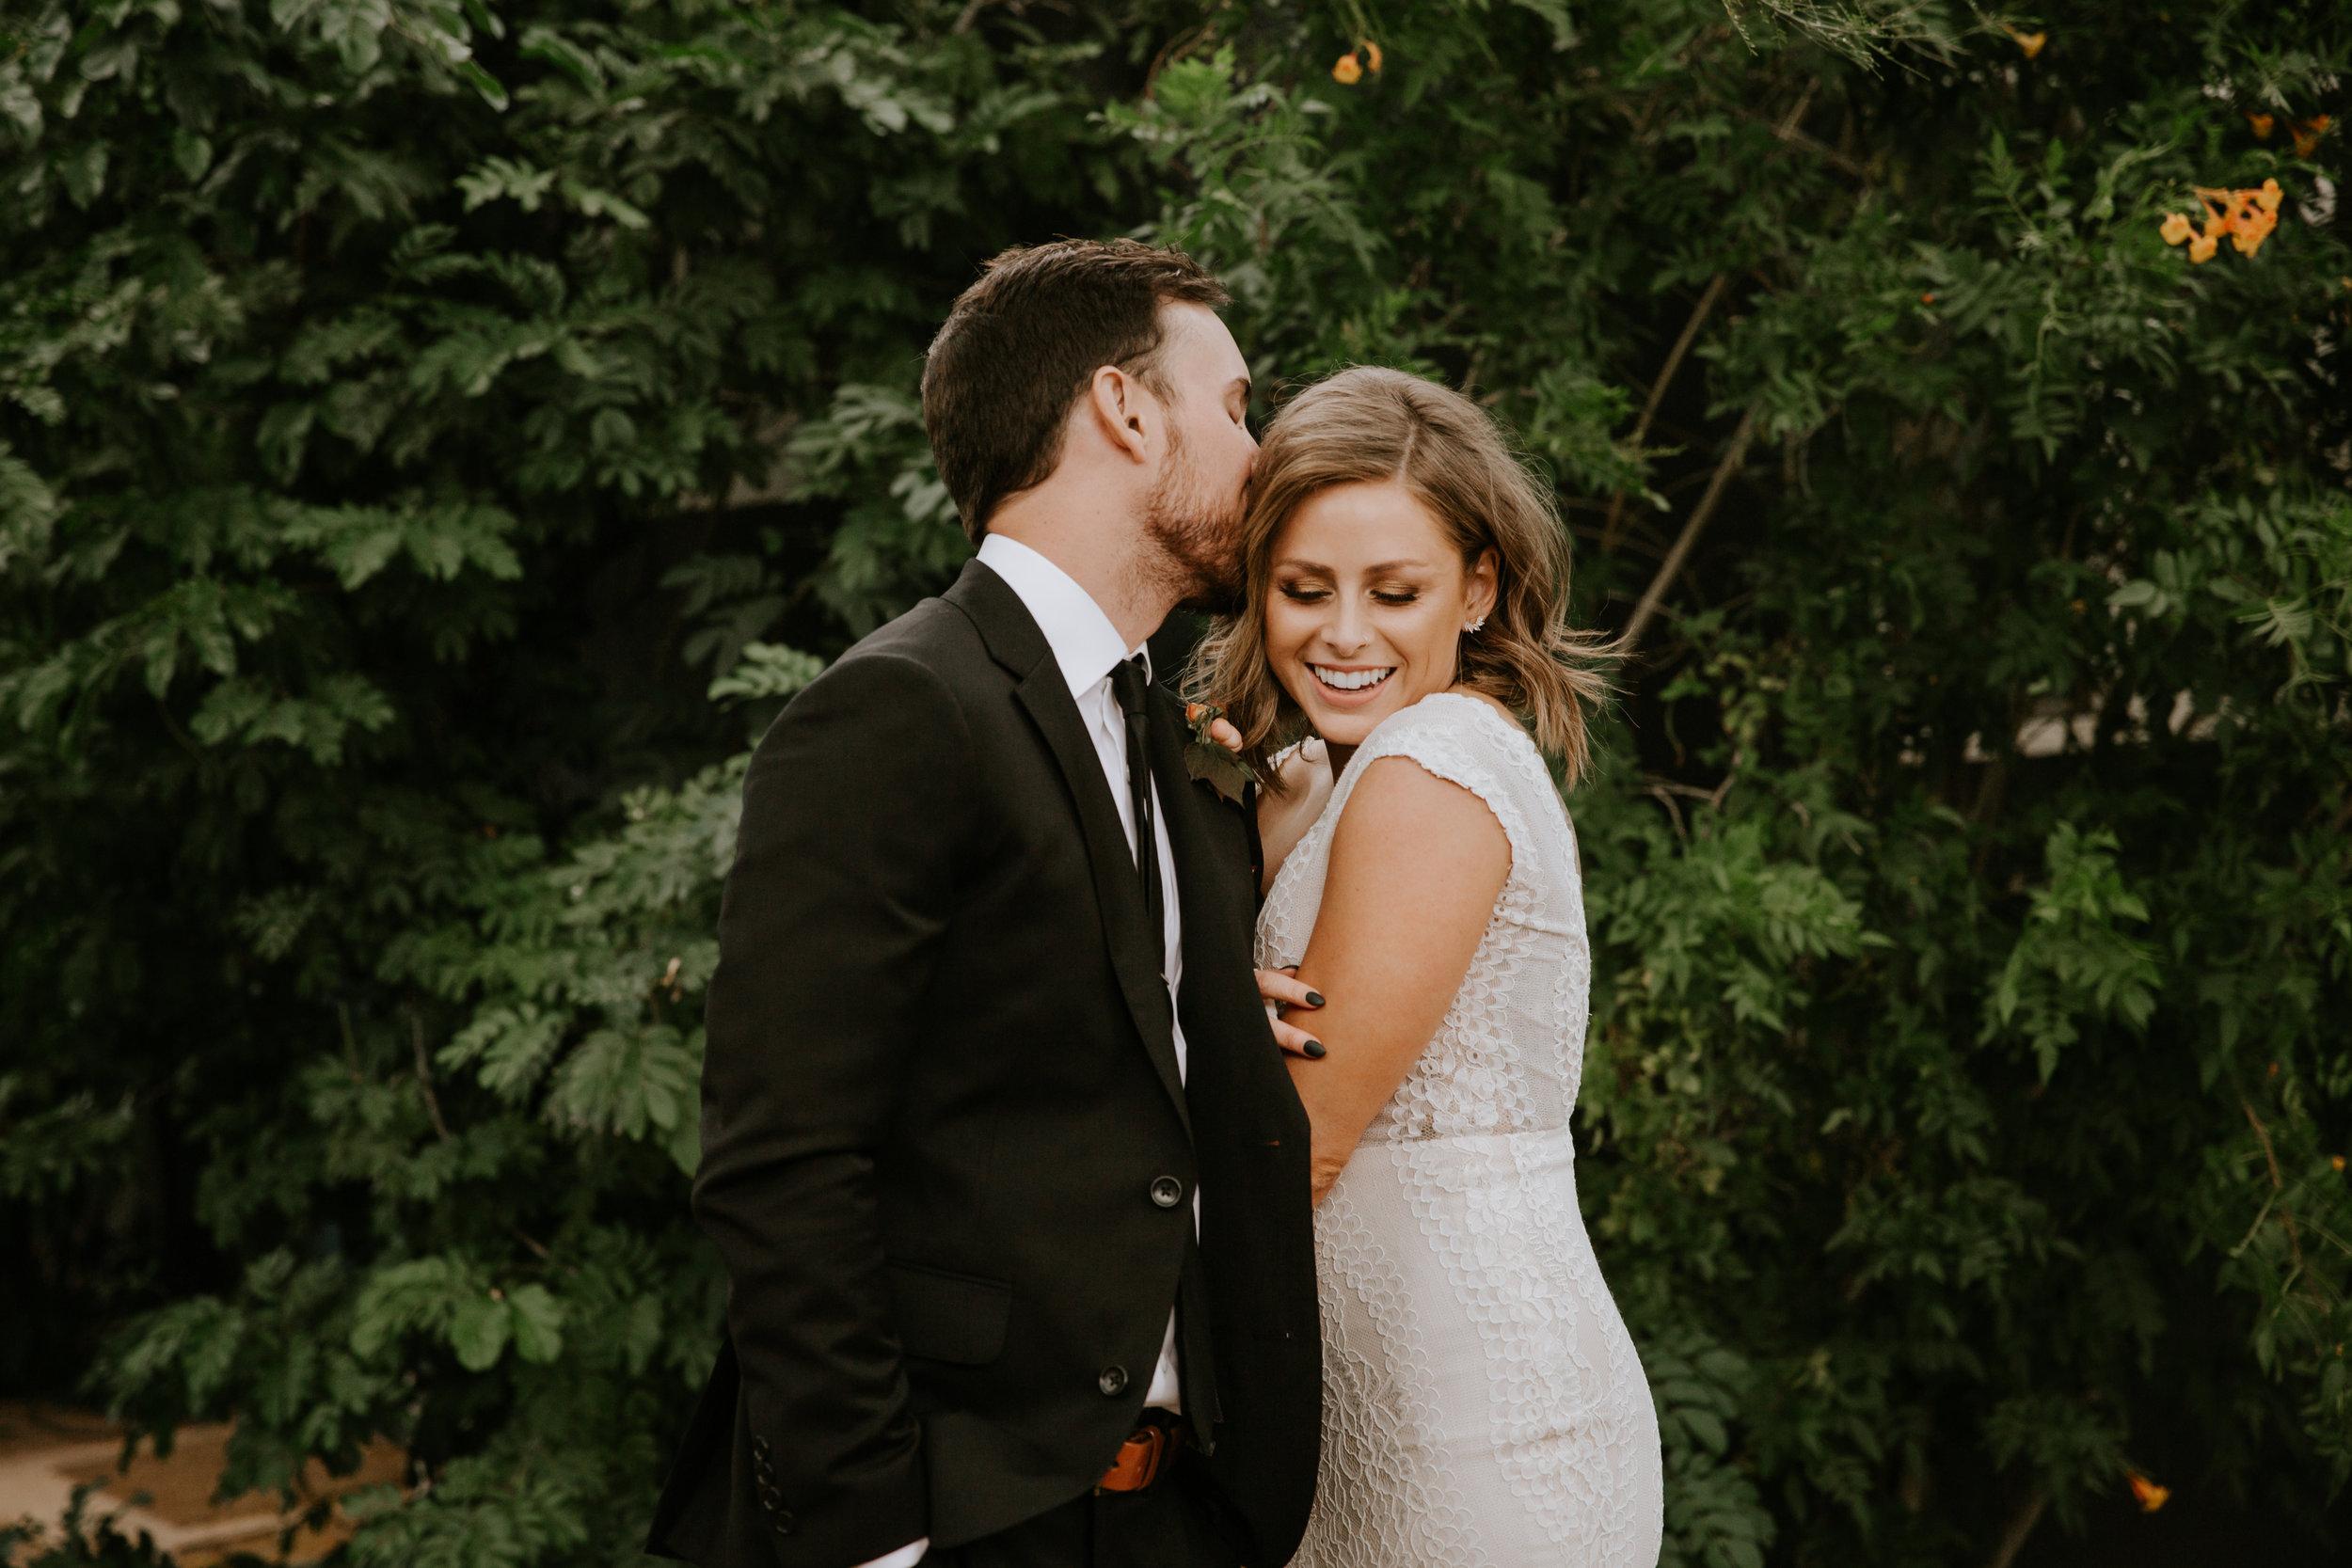 2019-05-26_Callie-Evan_Wedding_Joshua Tree_Paige Nelson_PREVIEWS HR-24.jpg